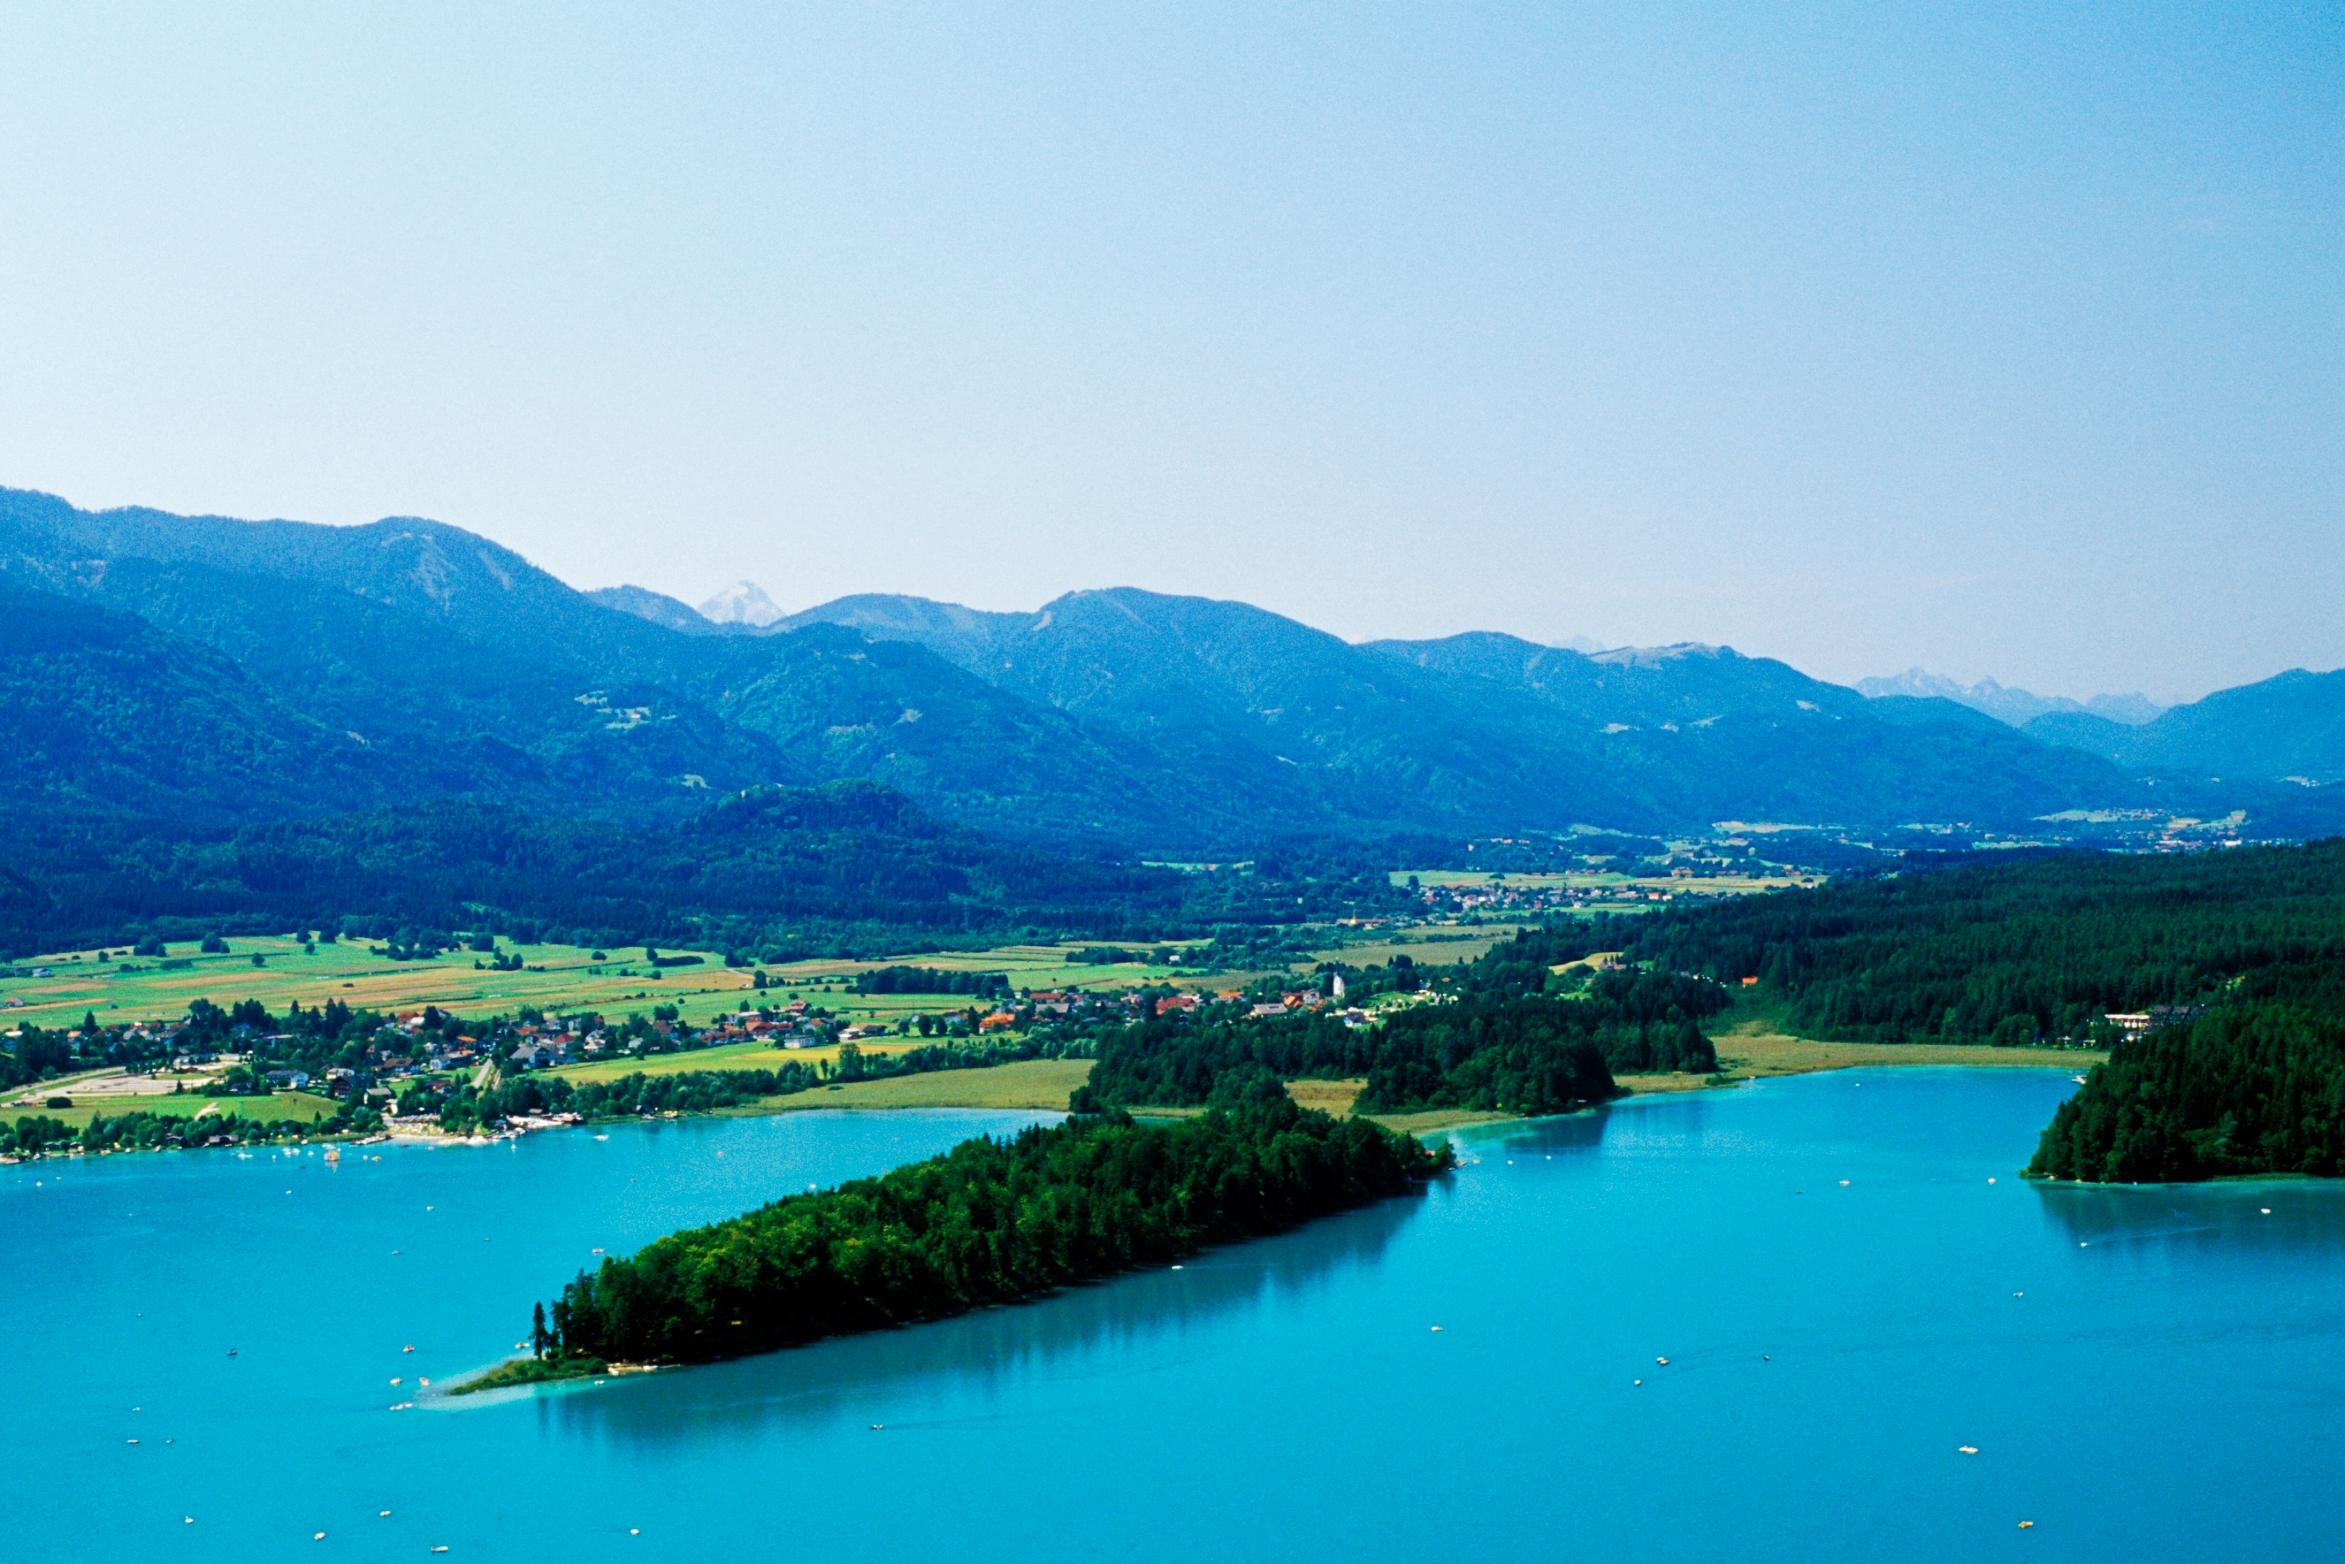 der türkisblaue Faakersee zählt zu den beliebtesten Badeseen in Kärnten